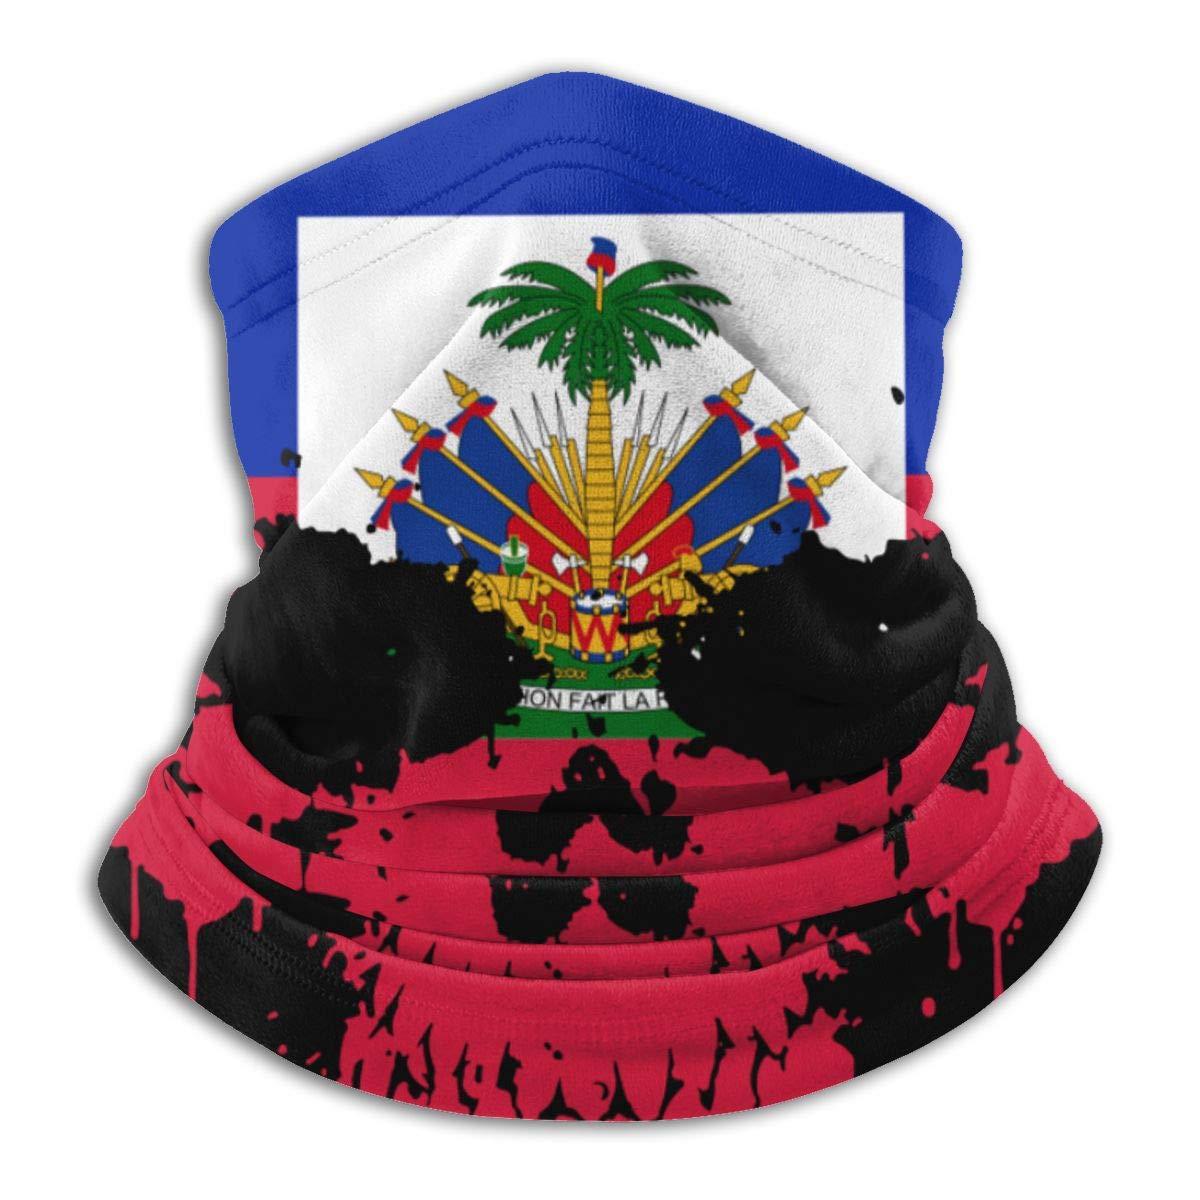 Haitian Haiti Skull Flag Neck Warmer Gaiter Balaclava Ski Mask Cold Weather Face Mask Winter Hats Headwear For Men Women Black